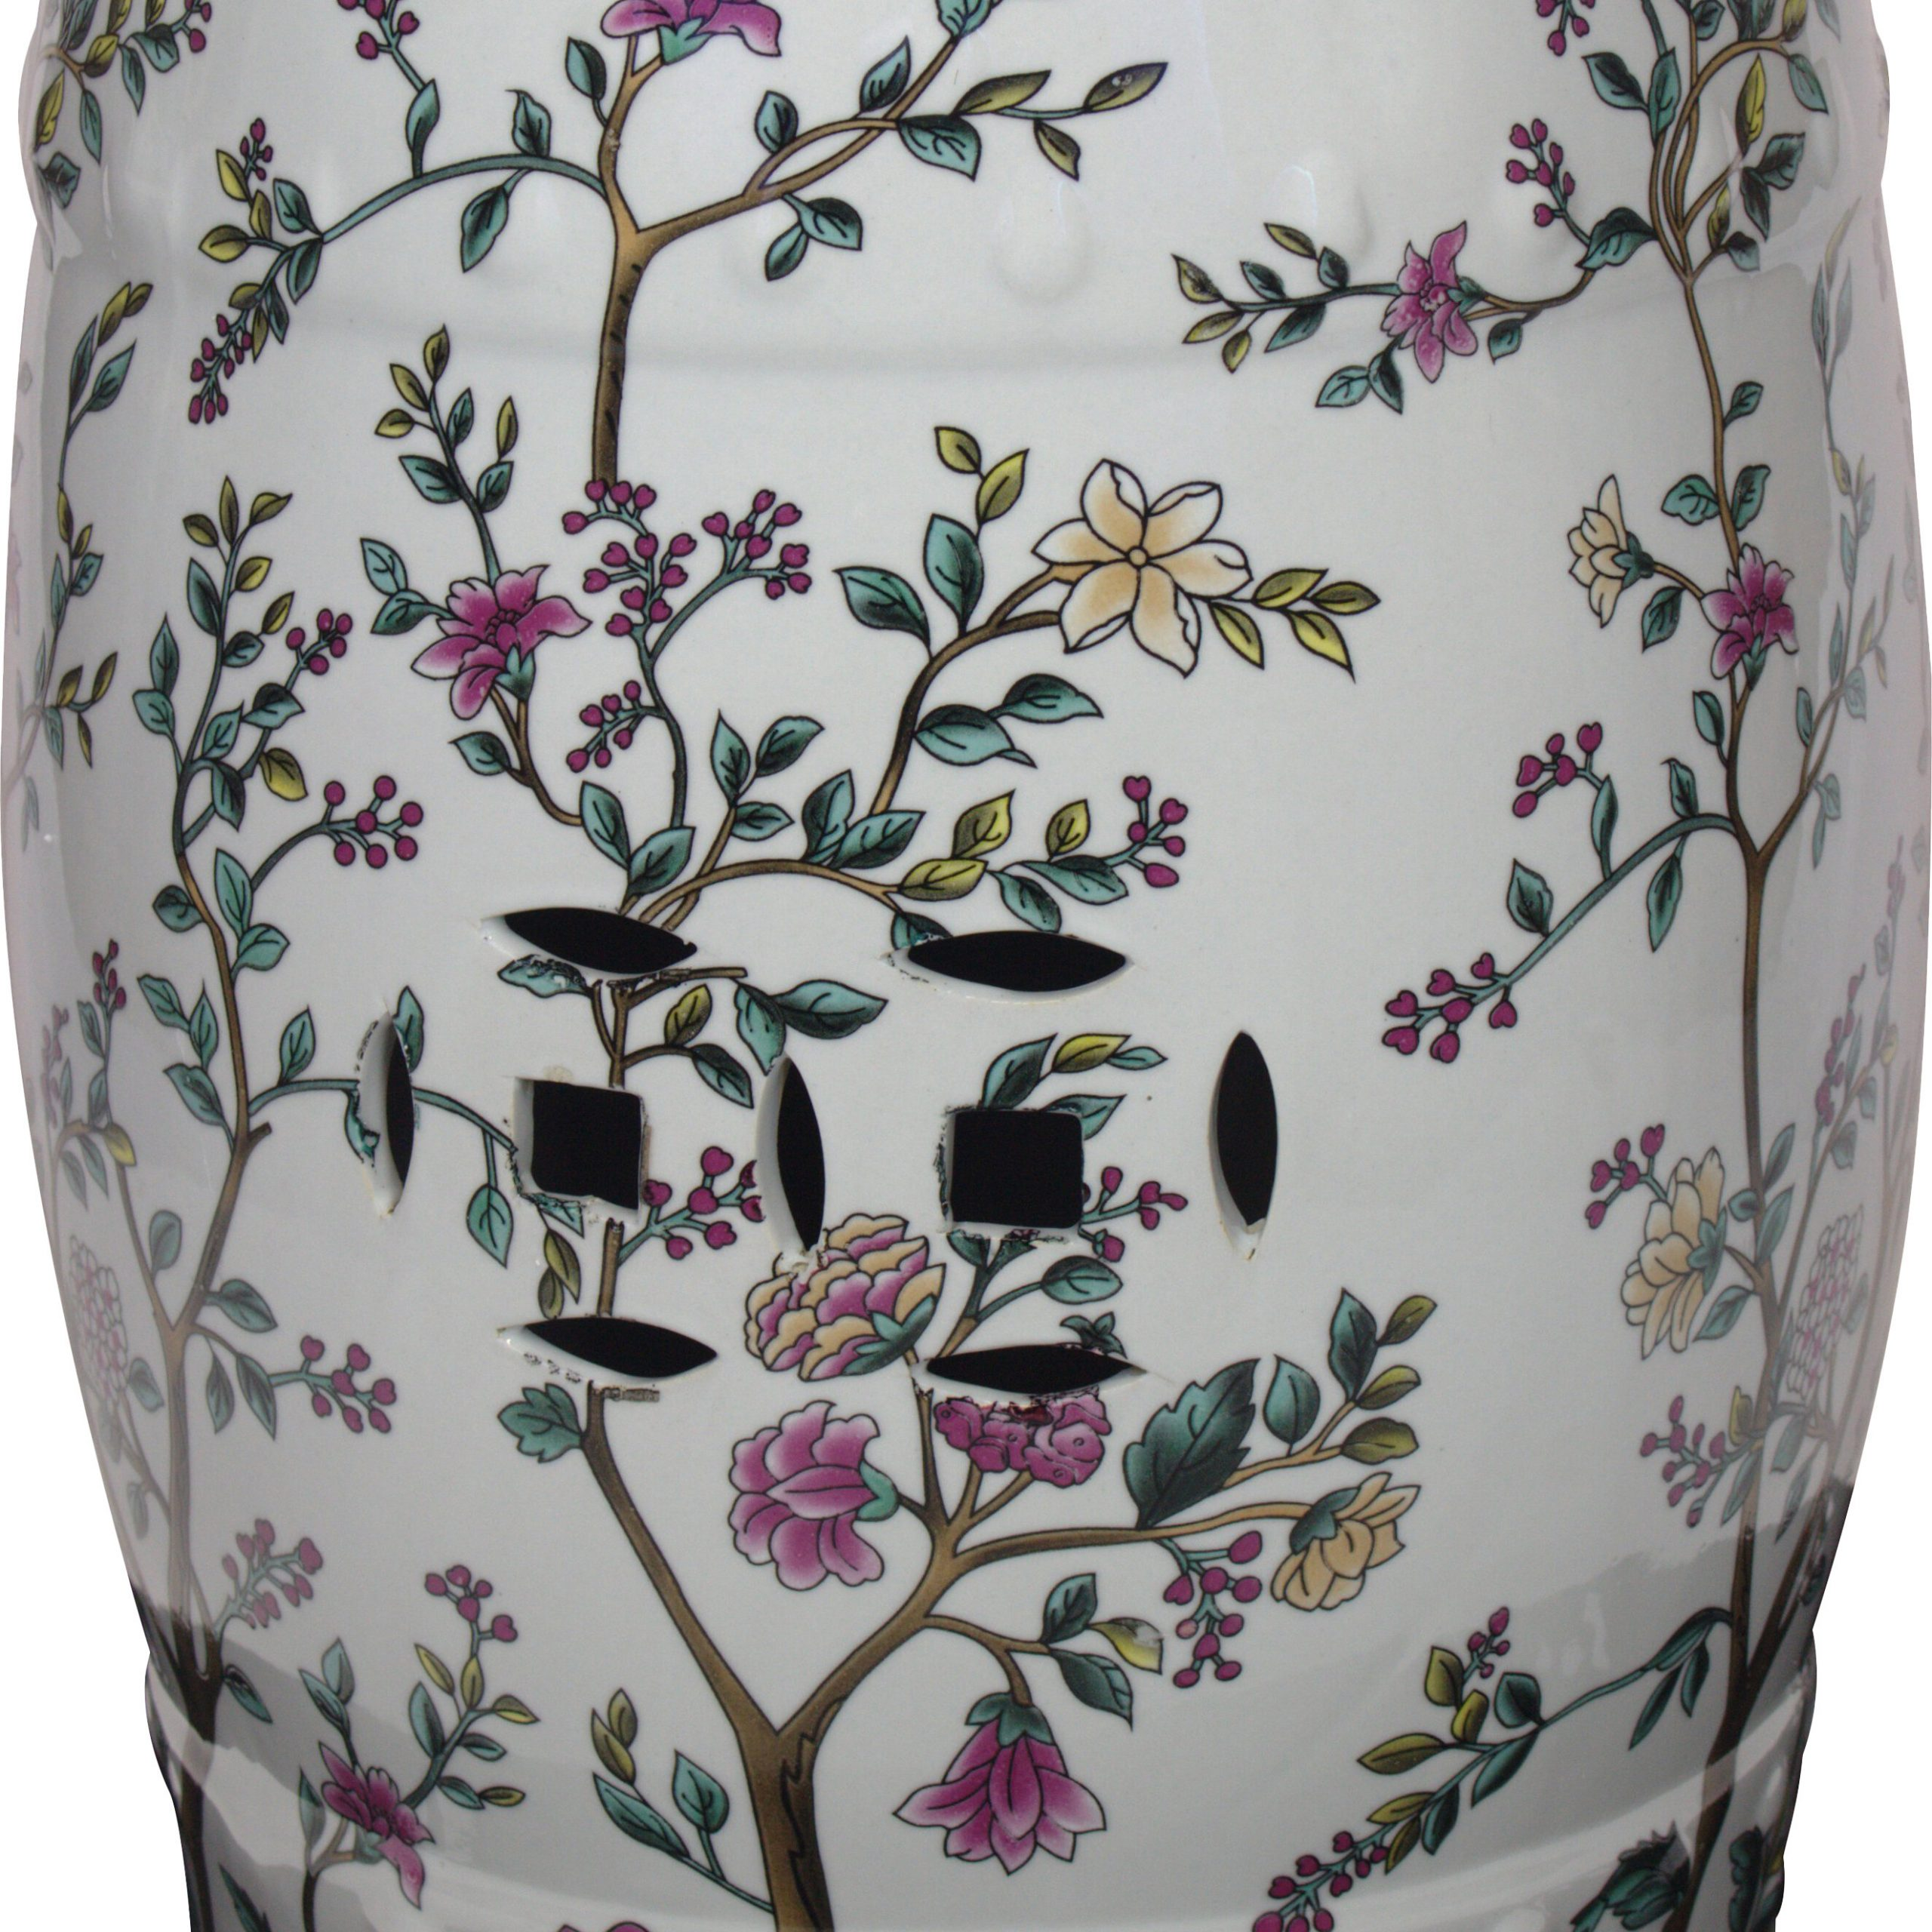 Ceramic Garden Stool Throughout Swanson Ceramic Garden Stools (View 4 of 25)